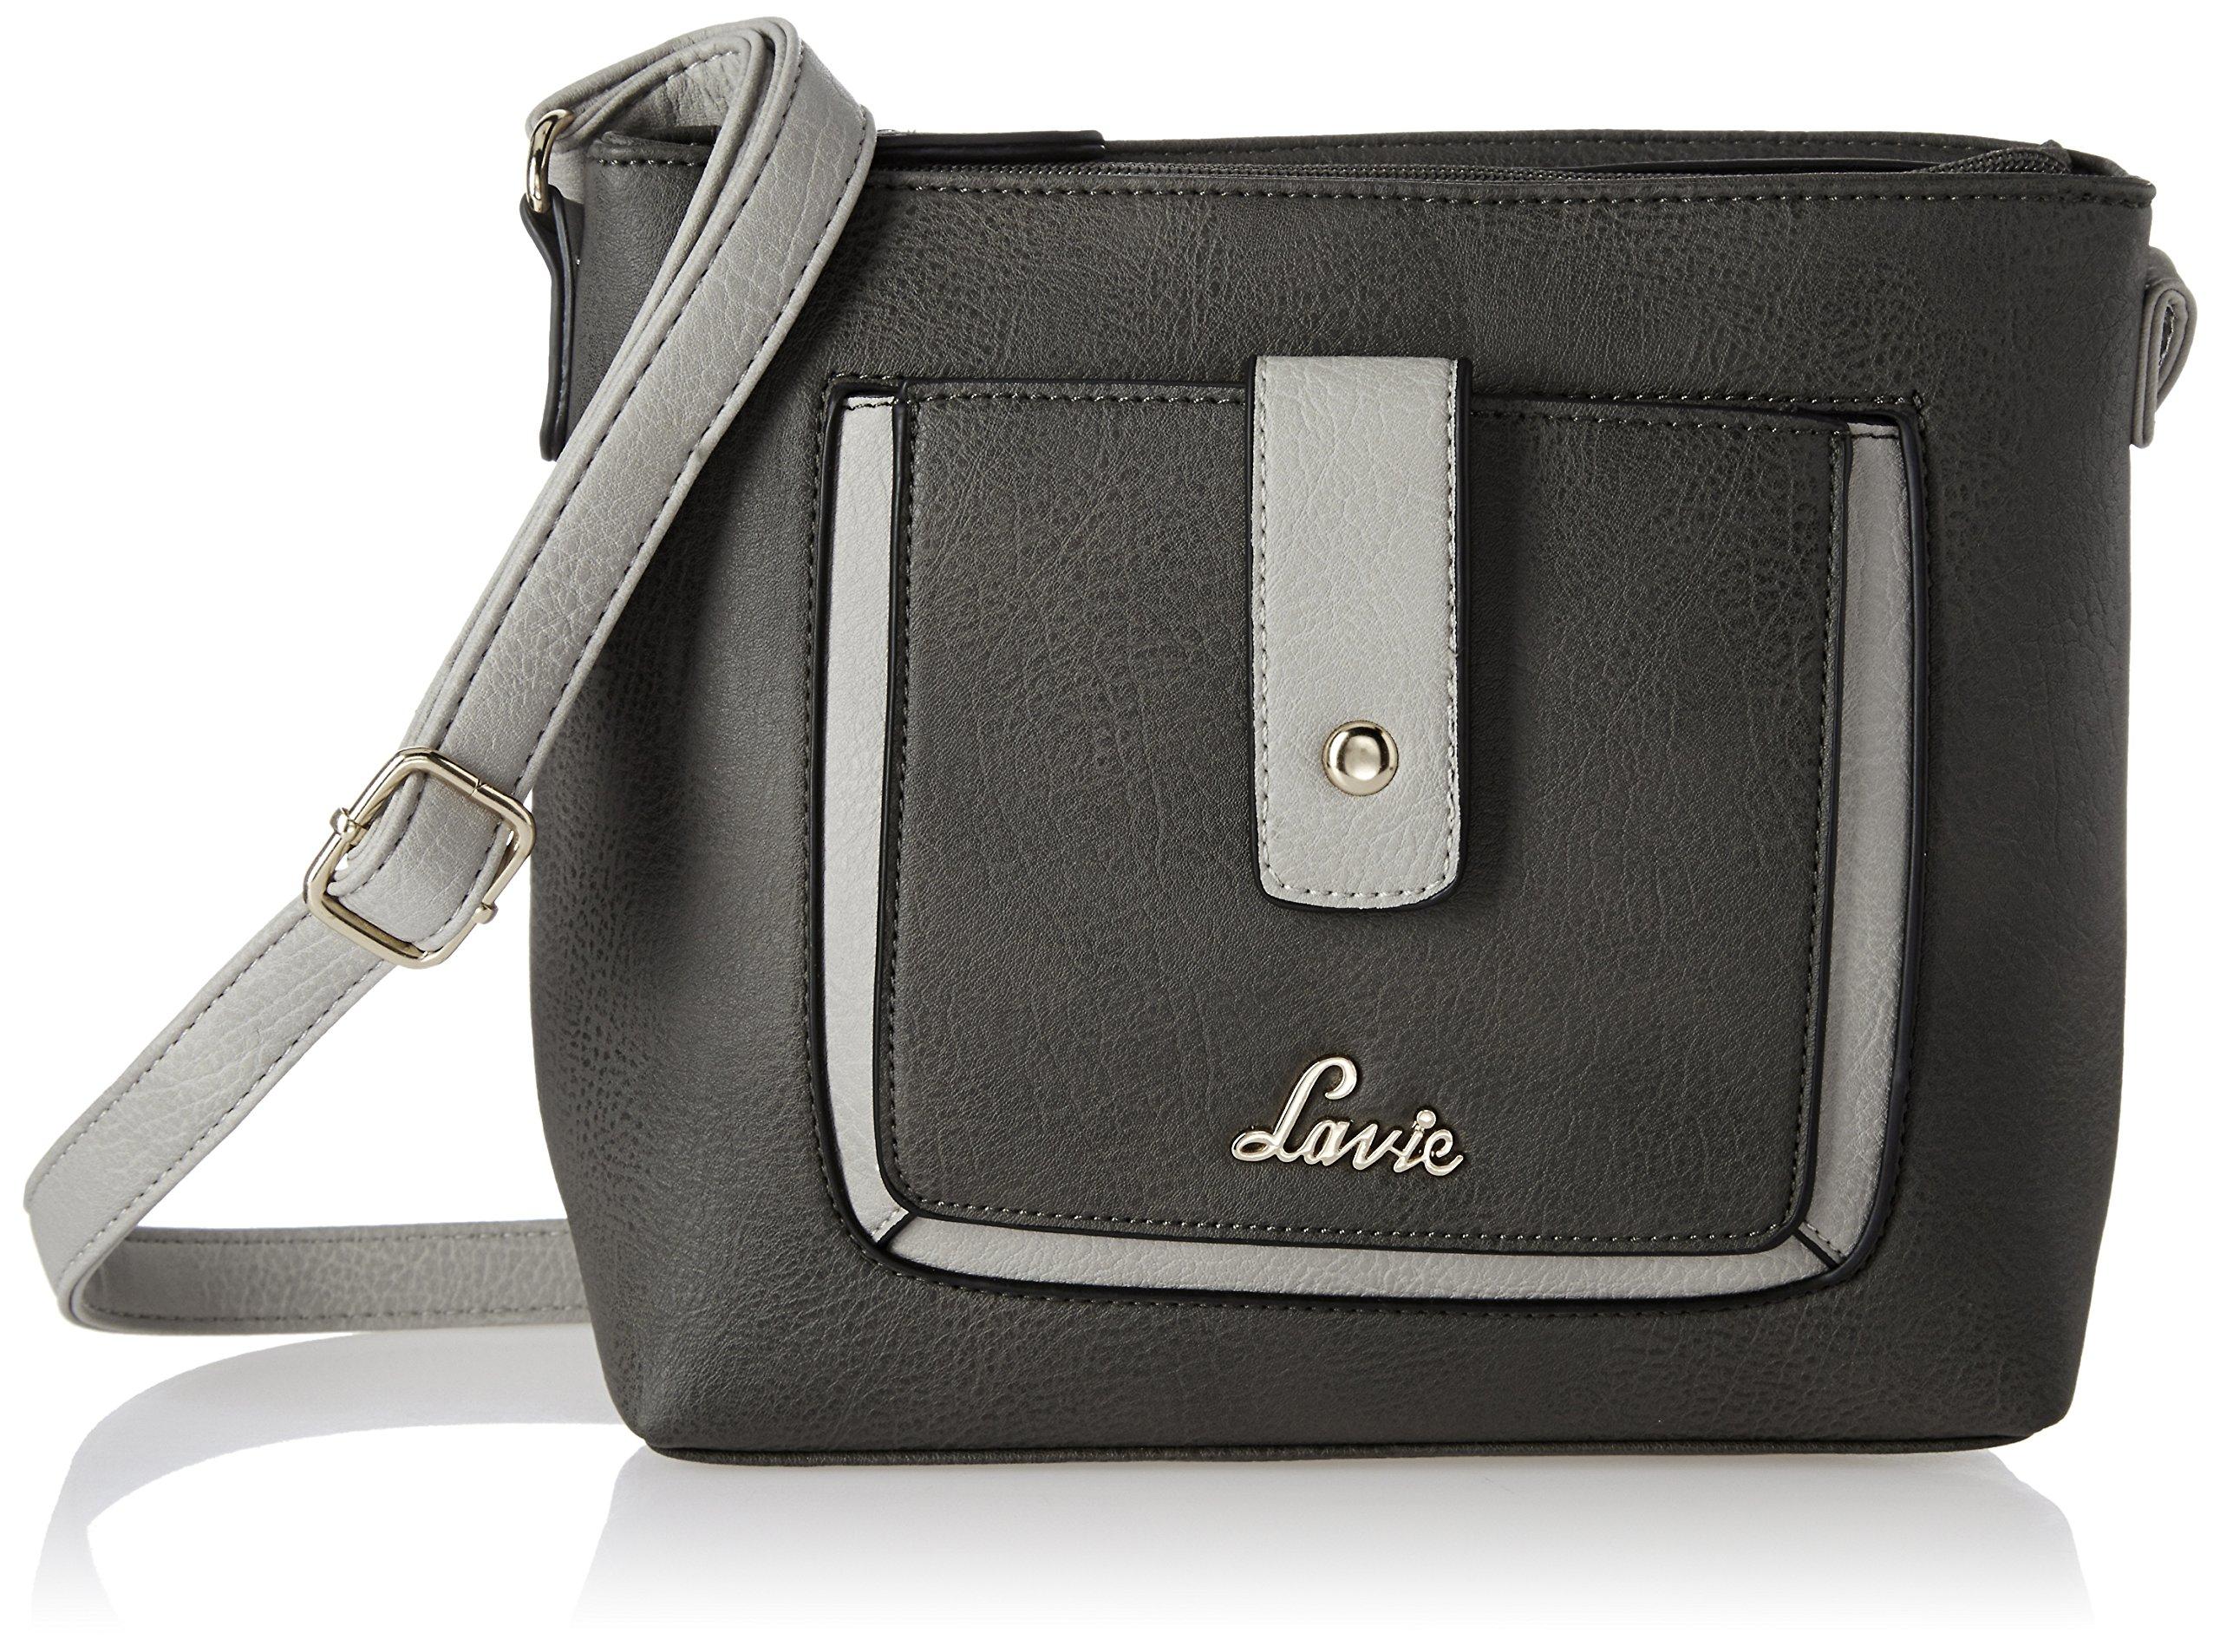 Lavie Jeffrey Women s Sling Bag (Dk.Grey) - Gia Designer f695ca67c1c35